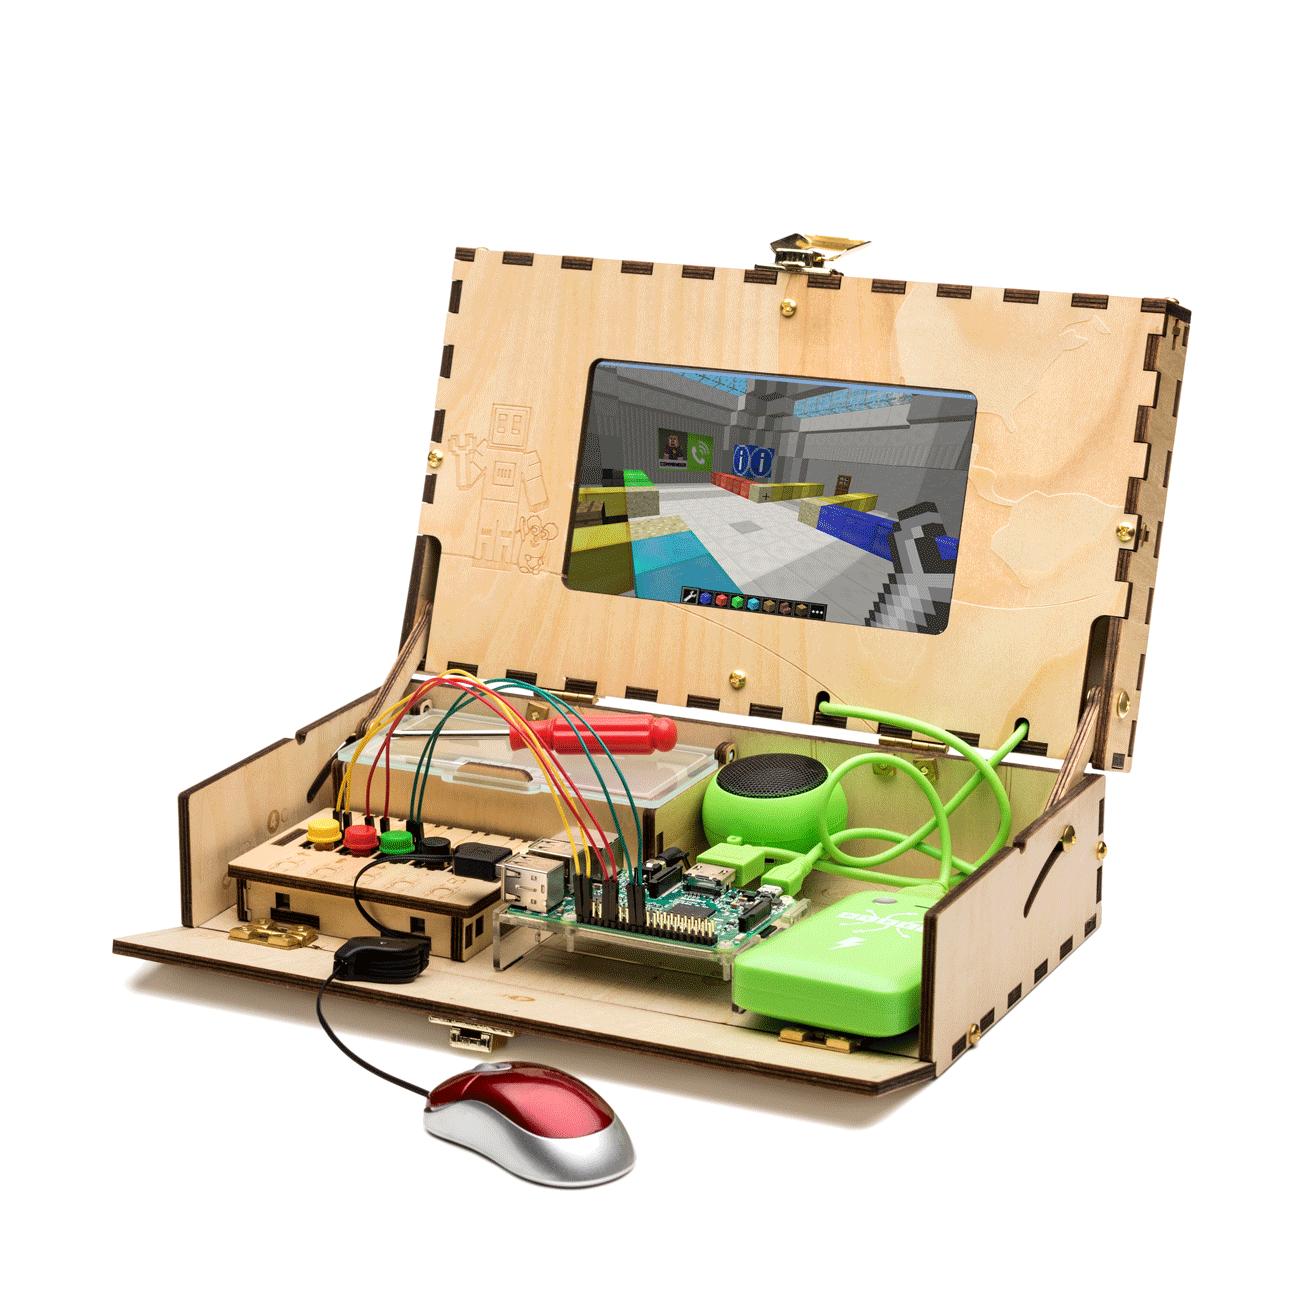 geschenke_computer_kit_kinder_piper_00801